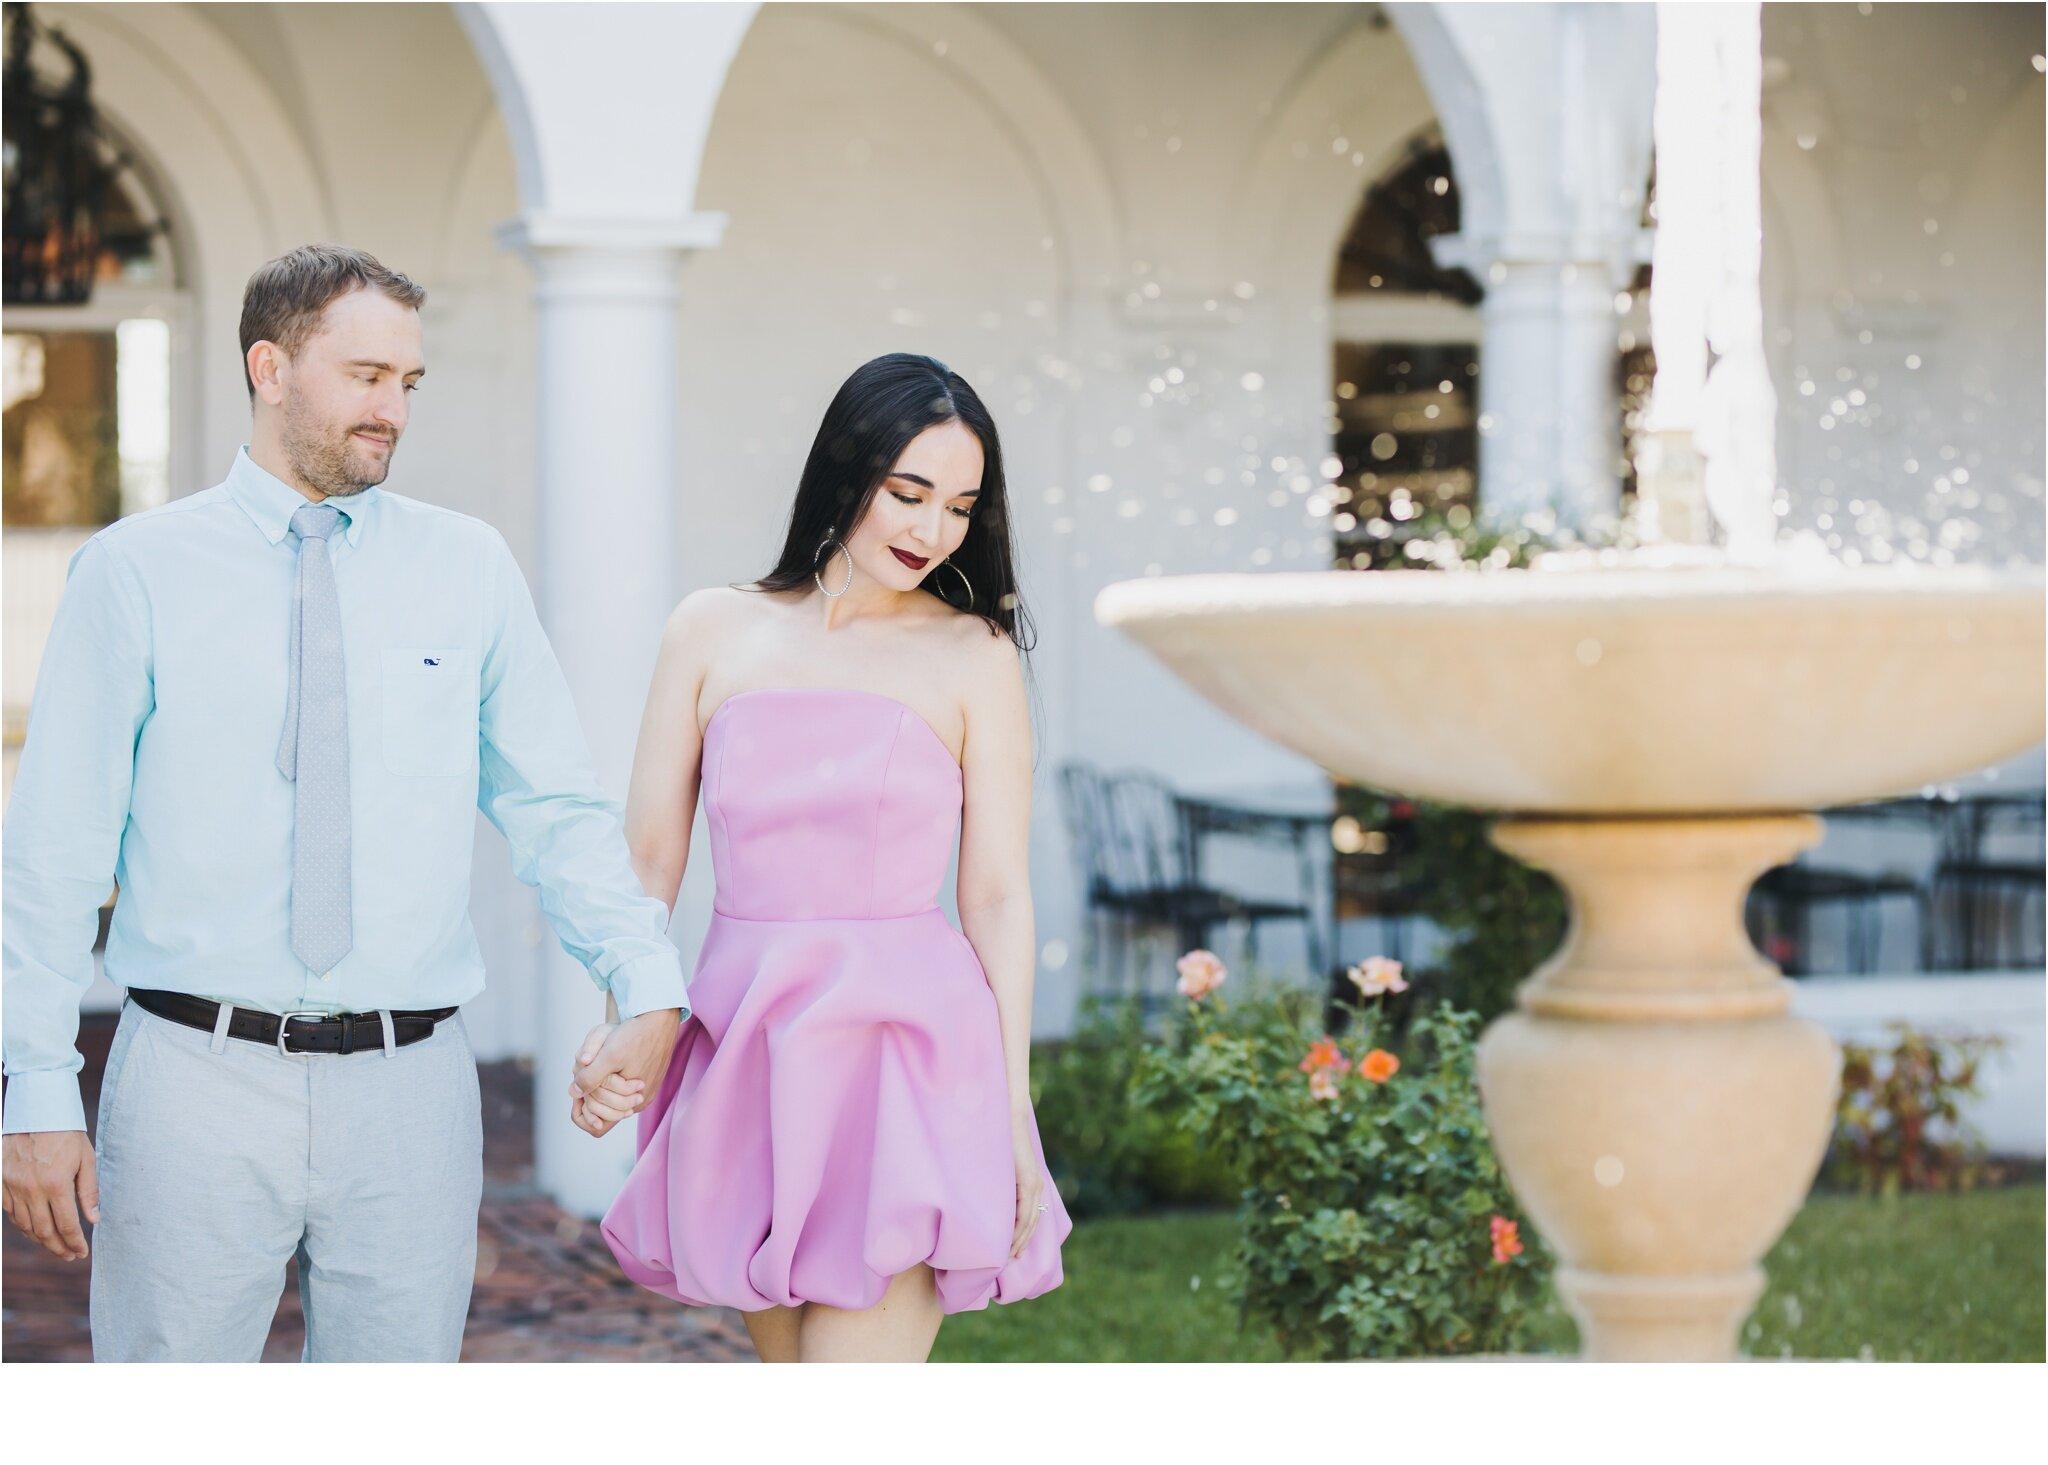 Rainey_Gregg_Photography_St._Simons_Island_Georgia_California_Wedding_Portrait_Photography_1818.jpg